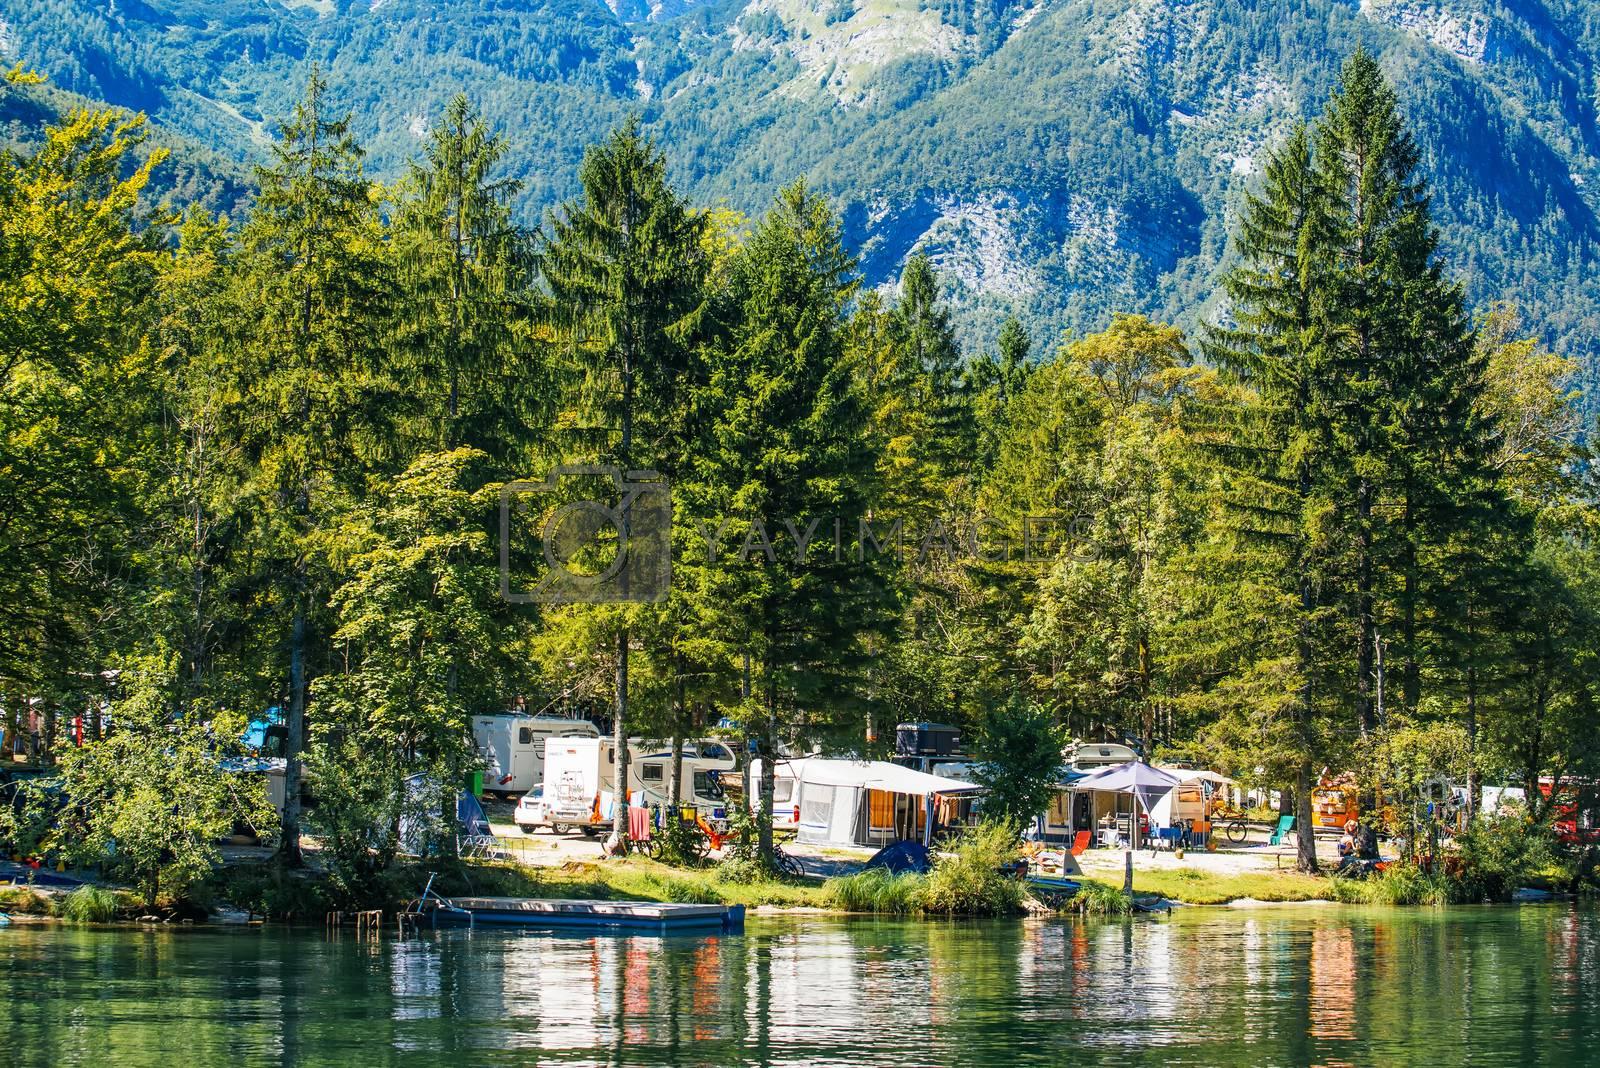 UKANC, SLOVENIA - AUGUST 24, 2016: Ukanc camping site on Bohinj lake in Slovenian national park Triglav.